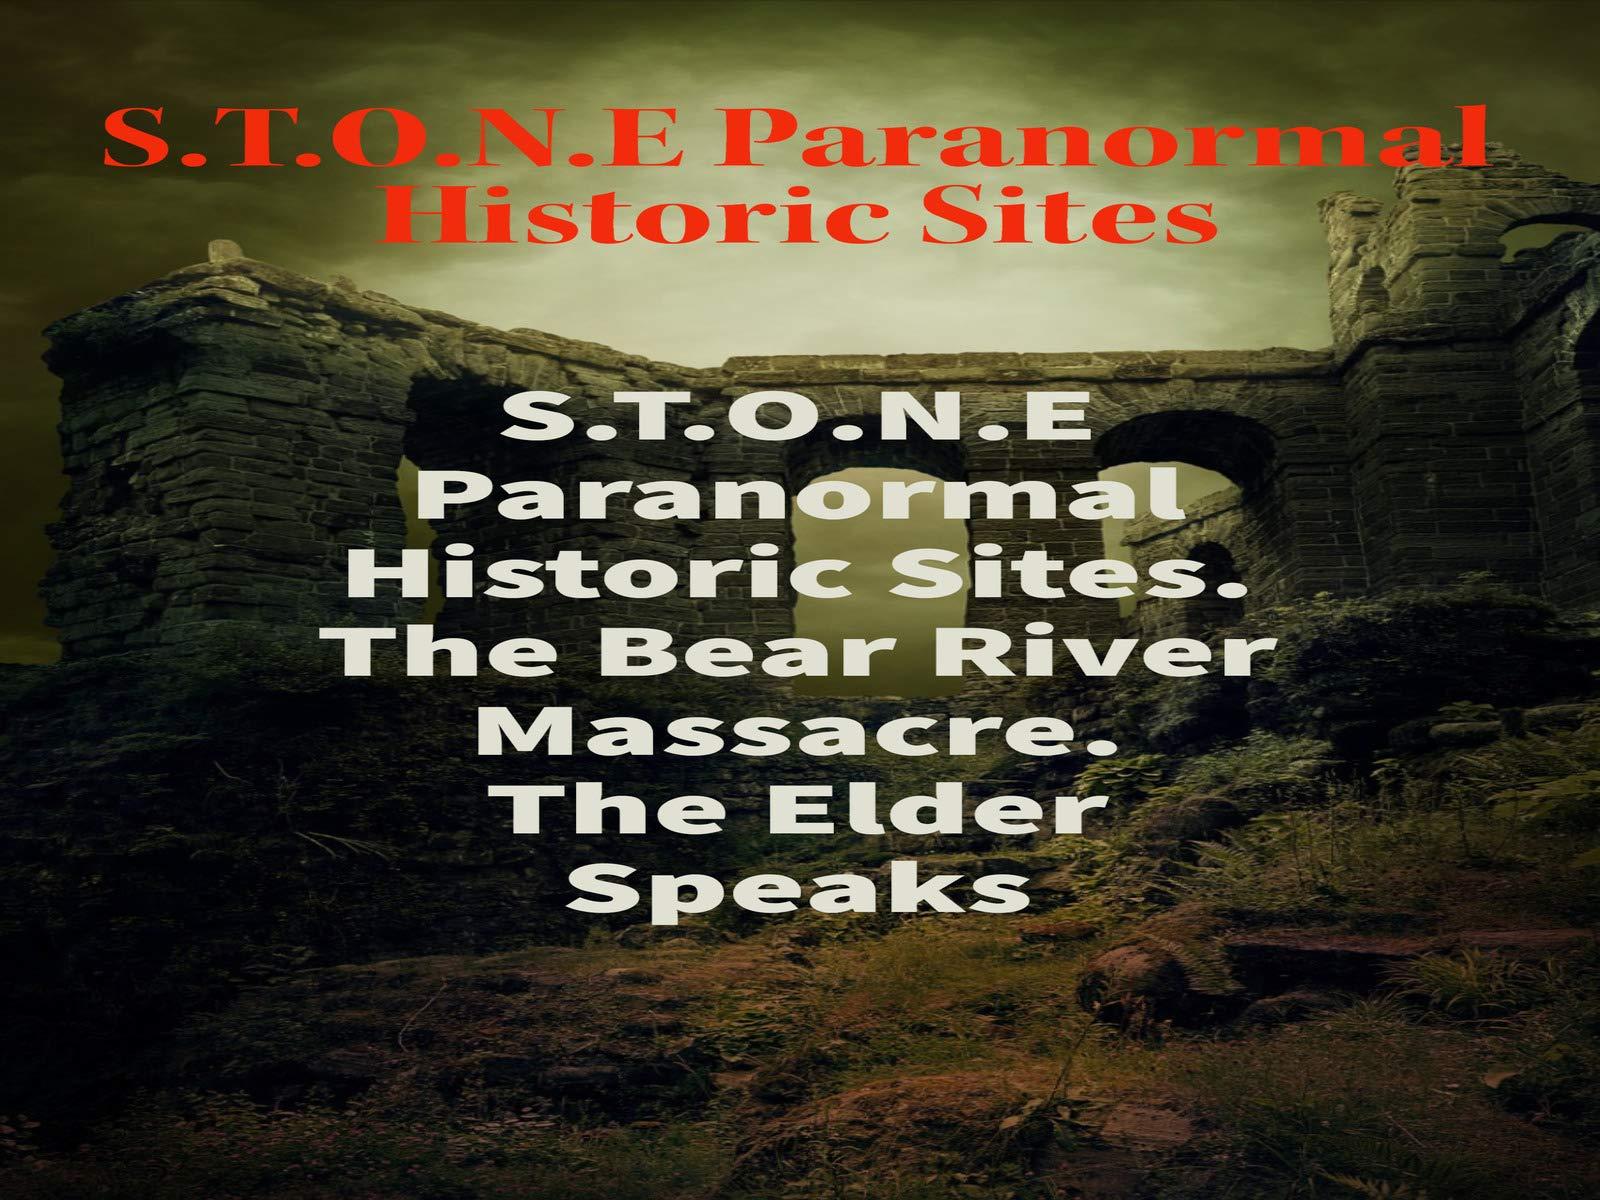 The Bear River Massacre A Elder Speaks on Amazon Prime Instant Video UK